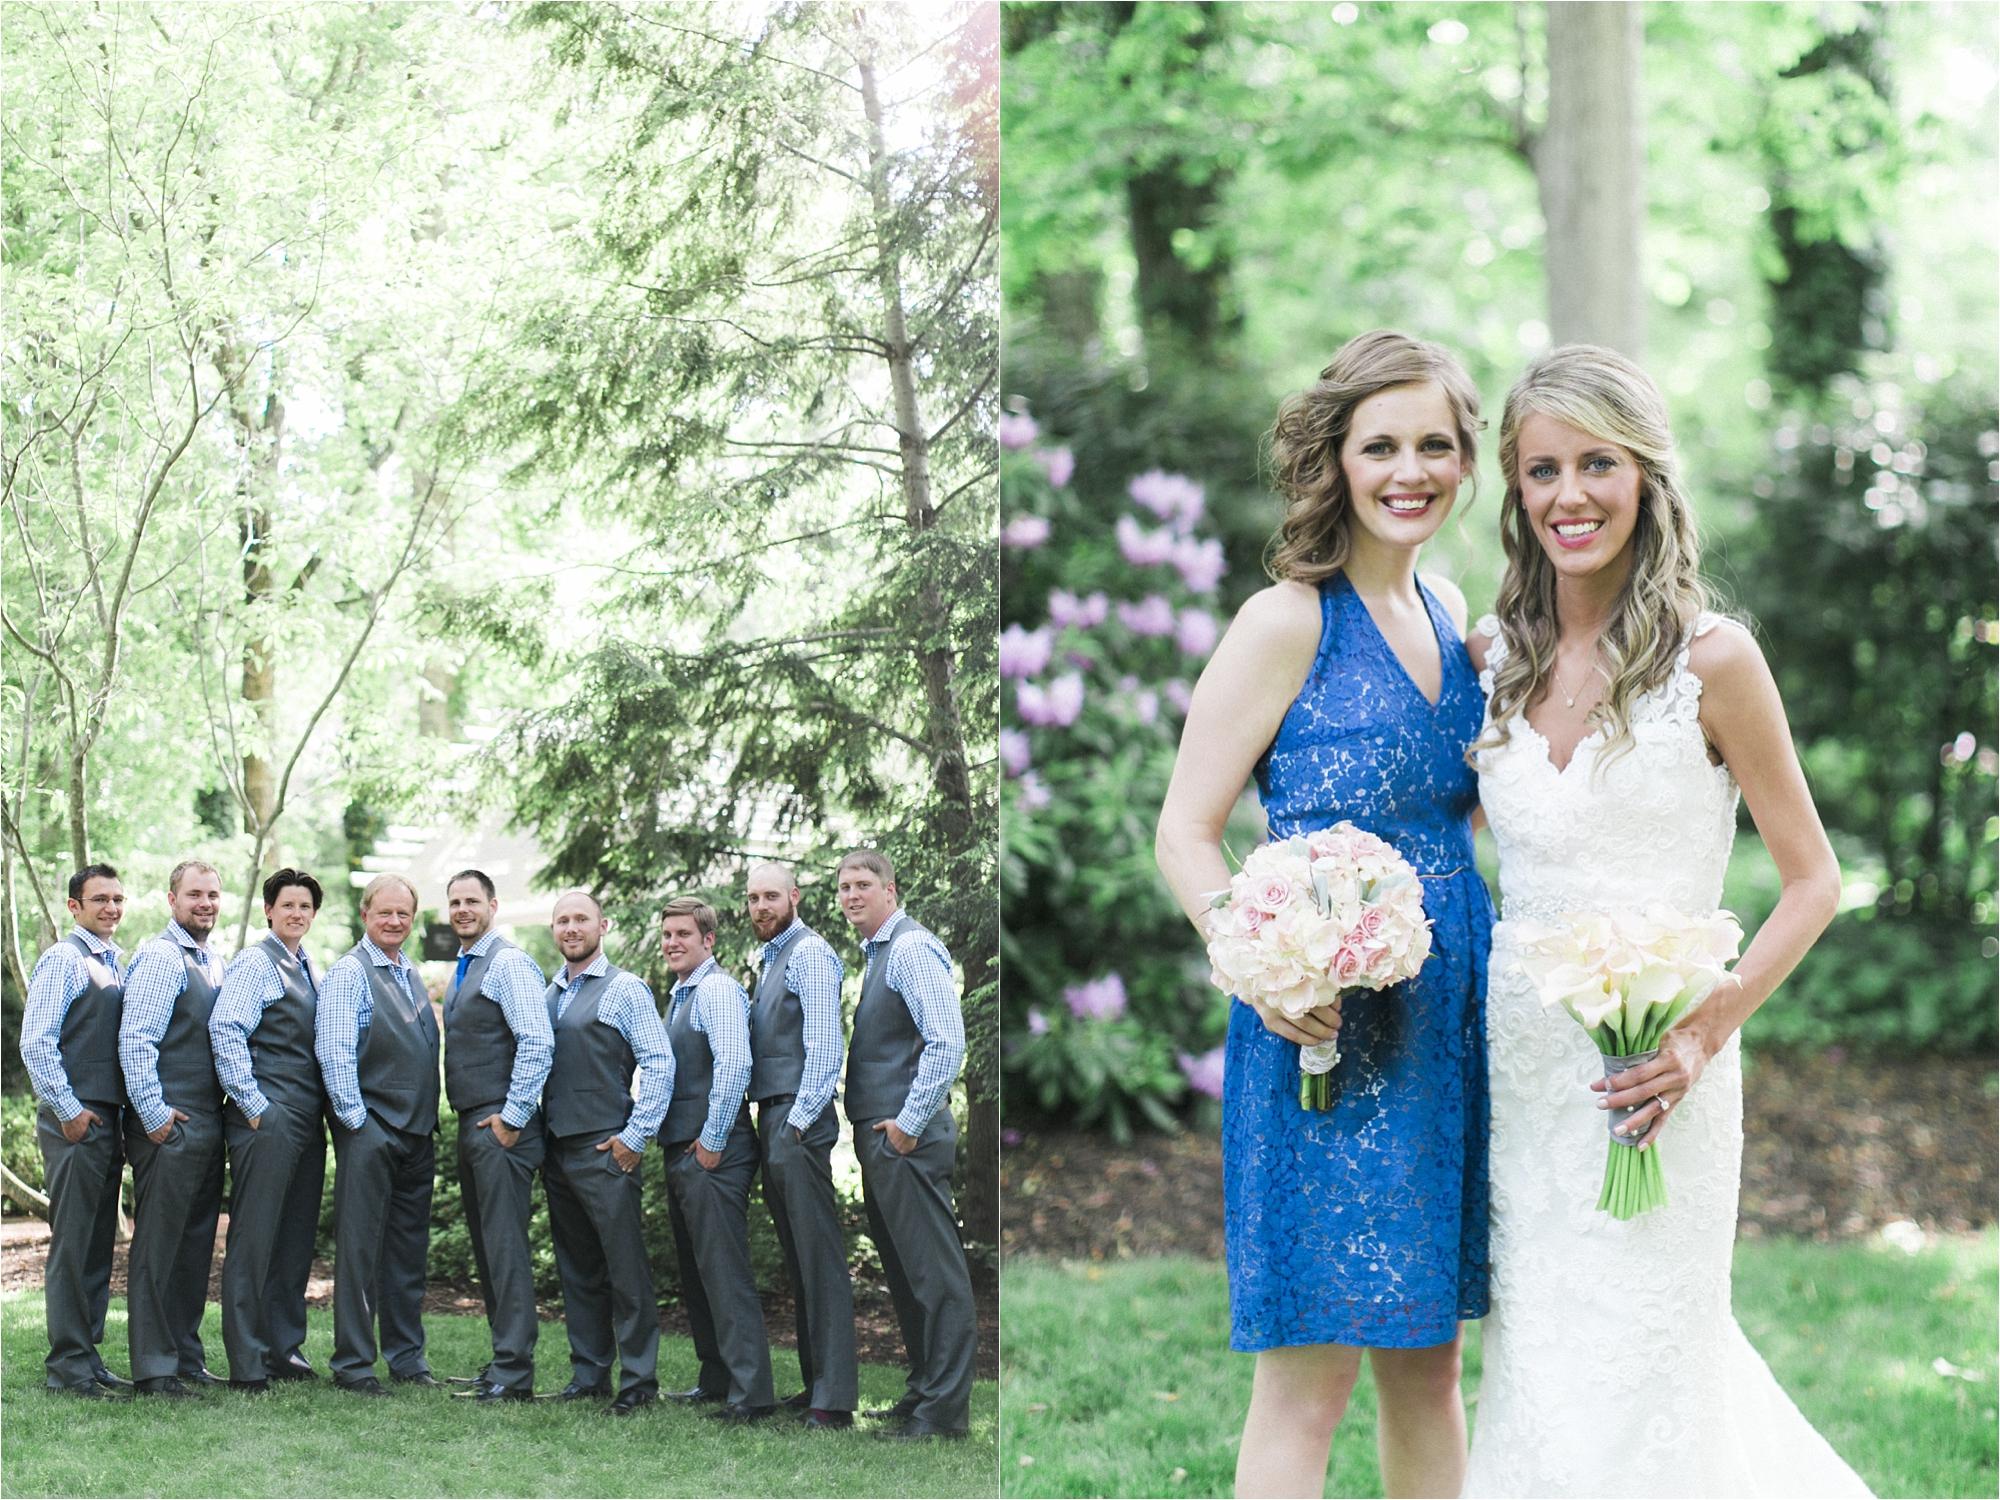 stephanie-yonce-boathouse-sunday-park-virginia-wedding-photo-011.JPG